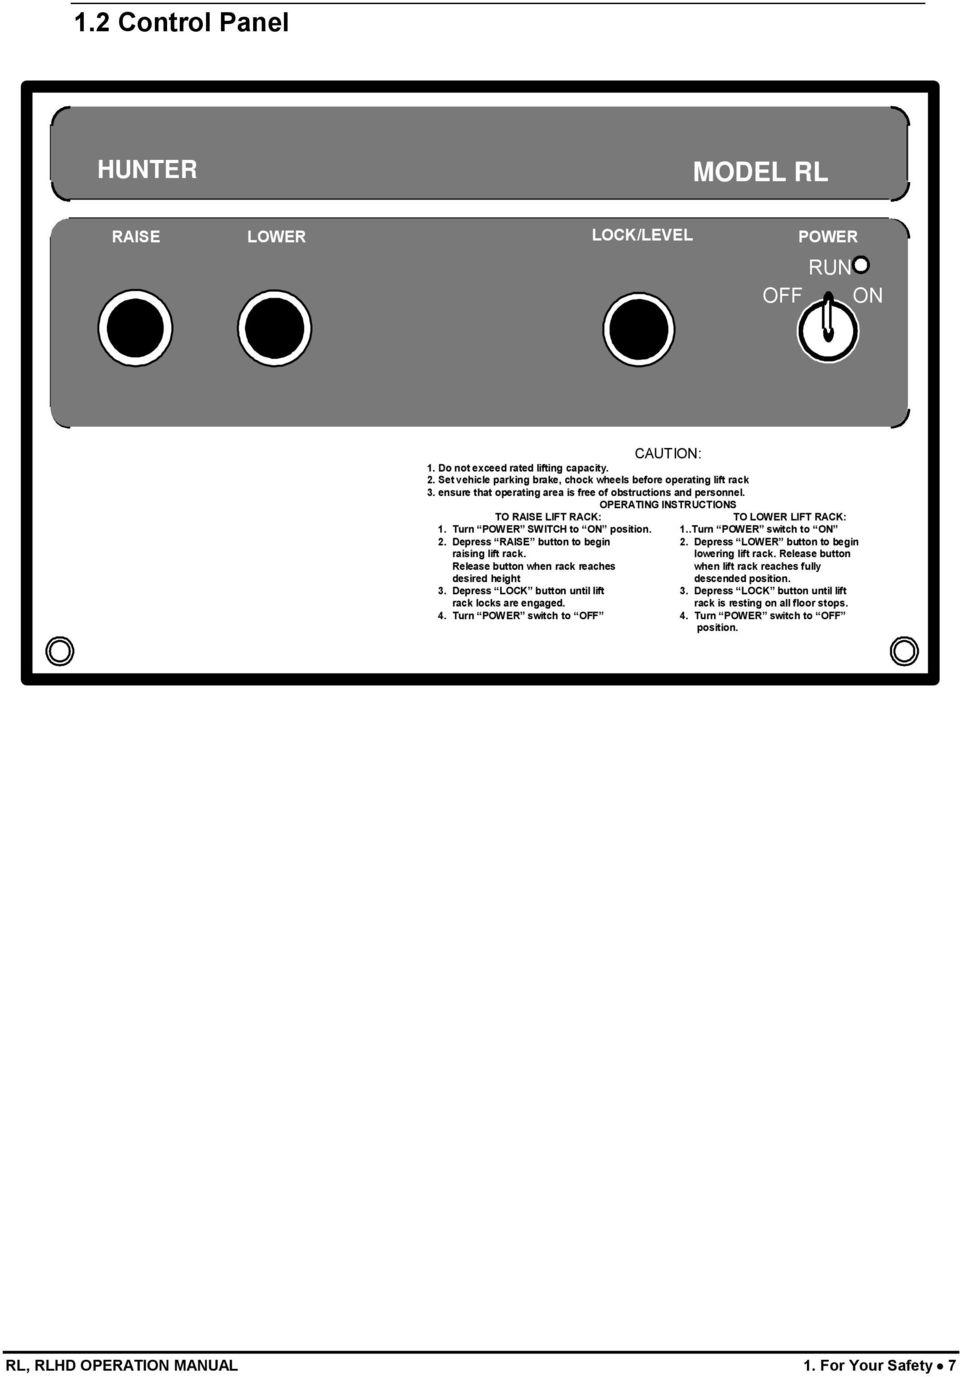 medium resolution of depress raise button to begin raising lift rack release button when rack reaches desired height